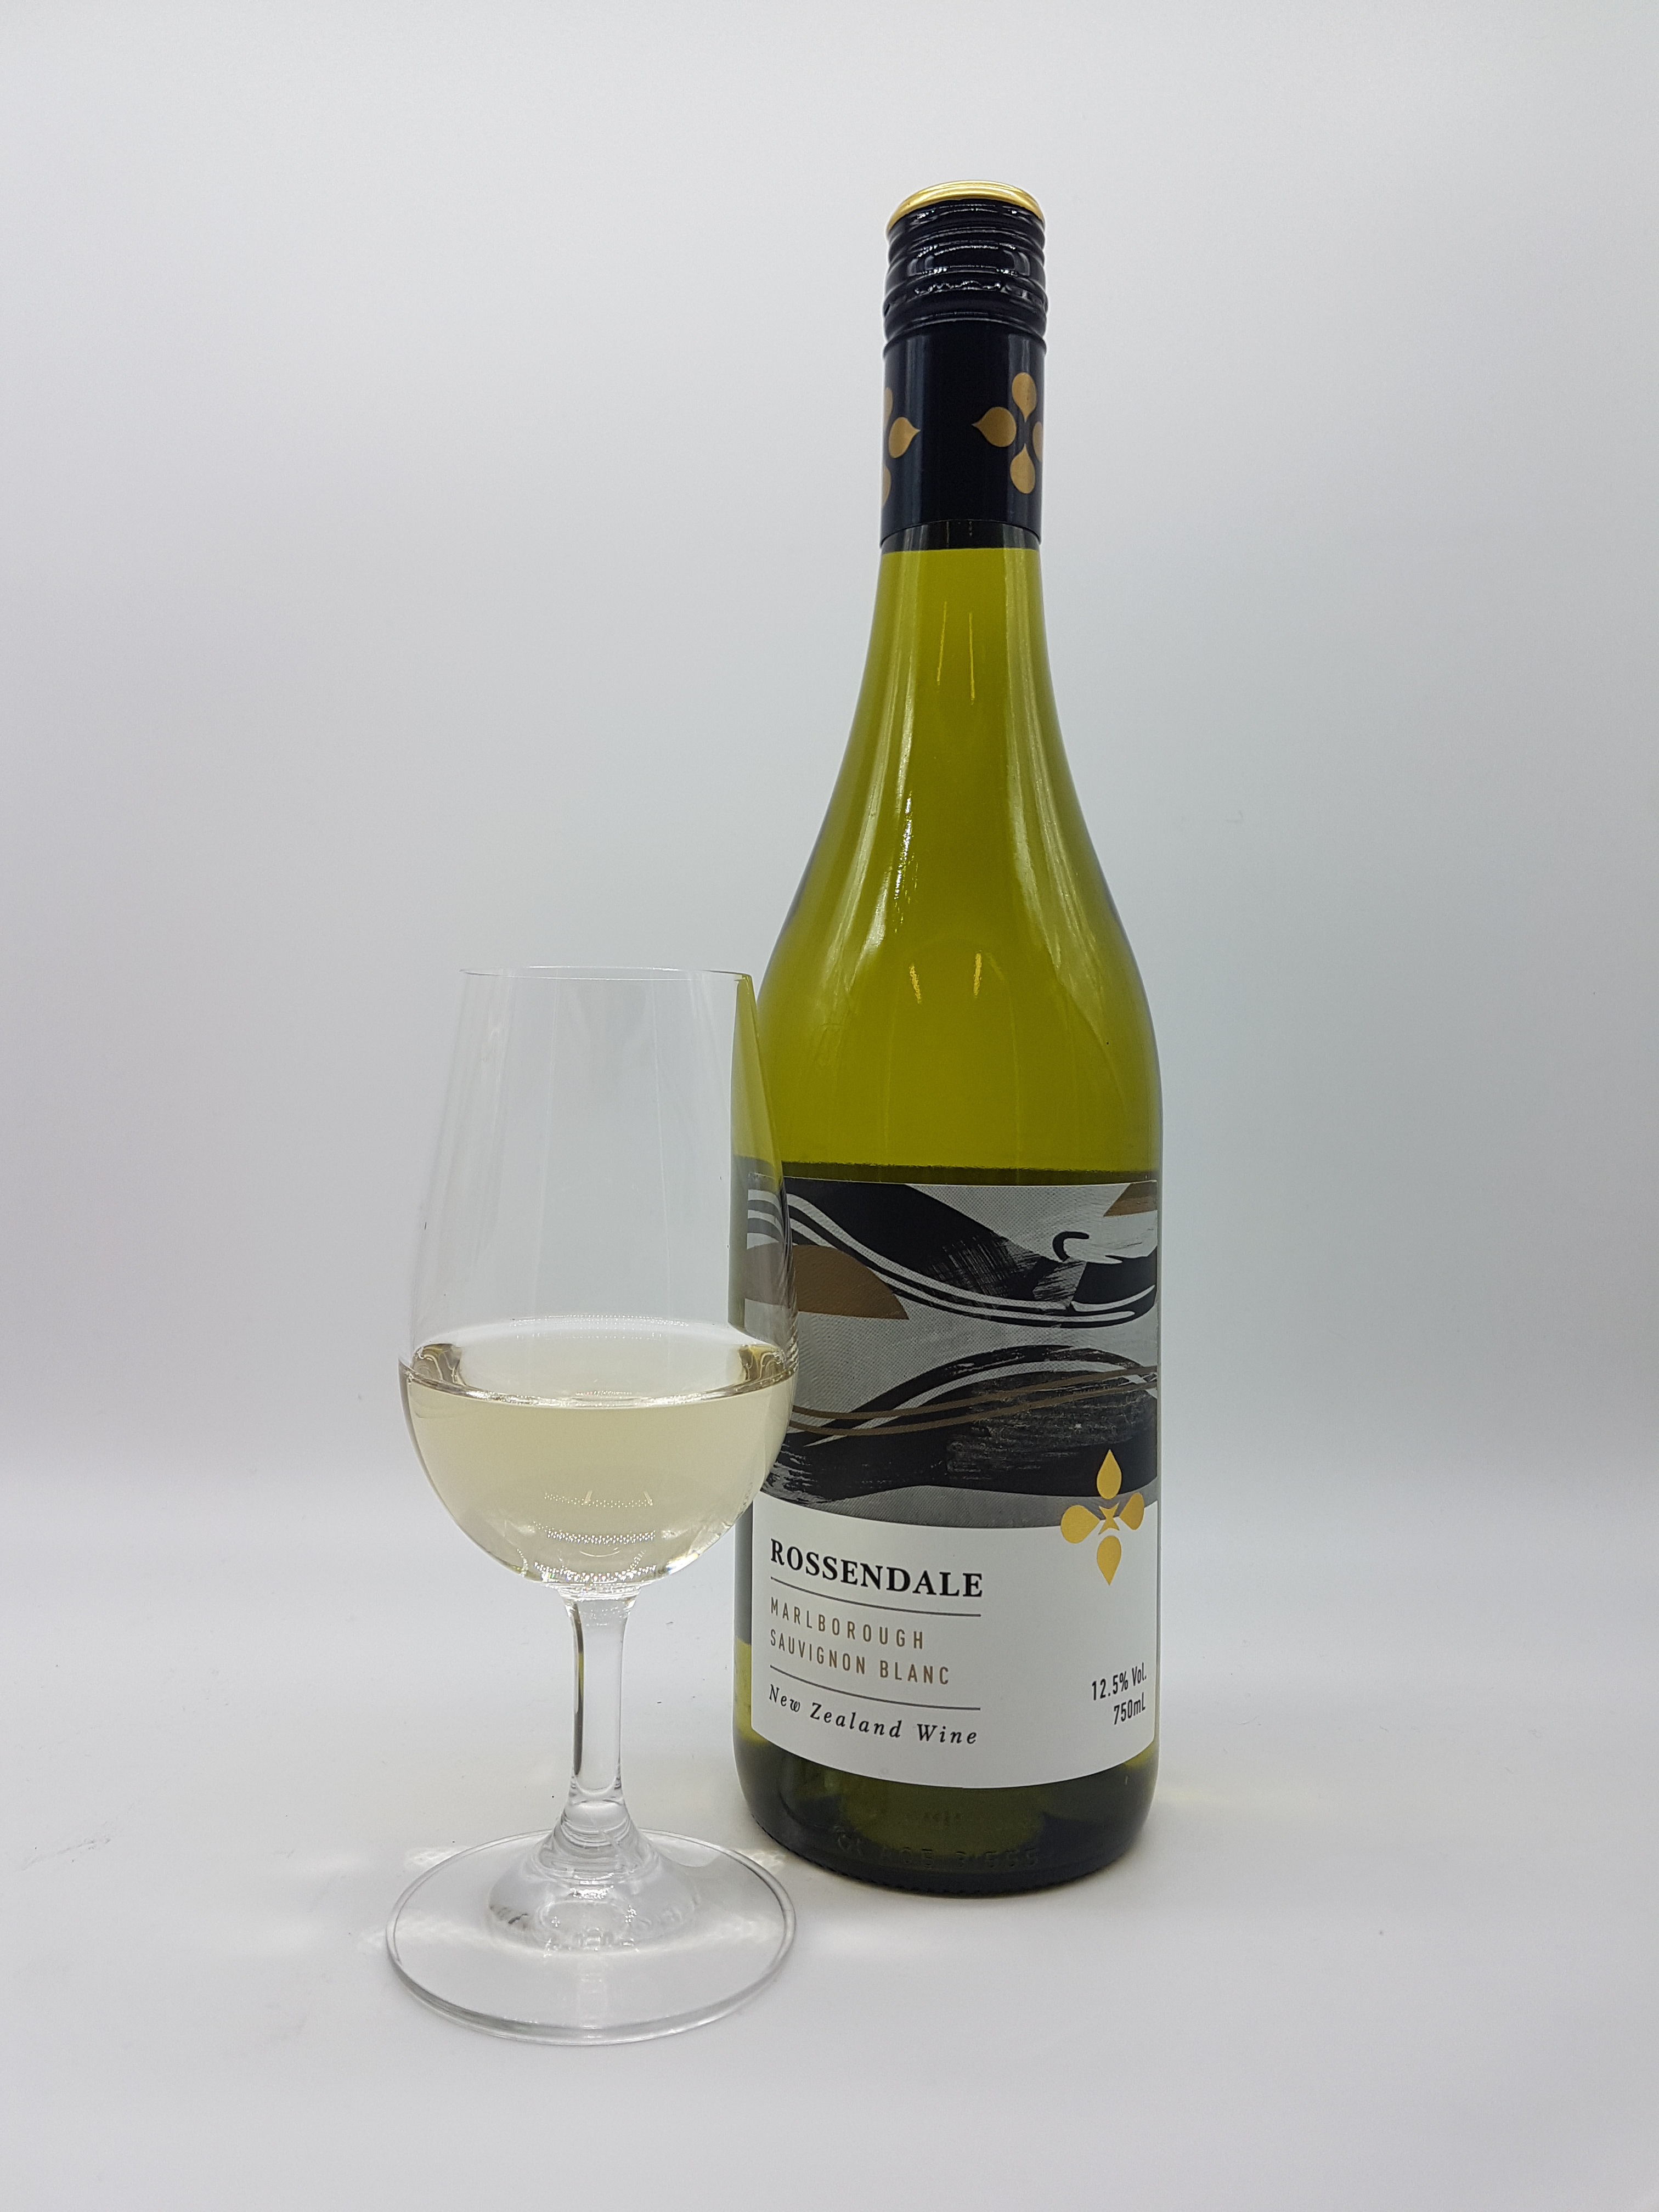 Rossendale Sauvignon Blanc